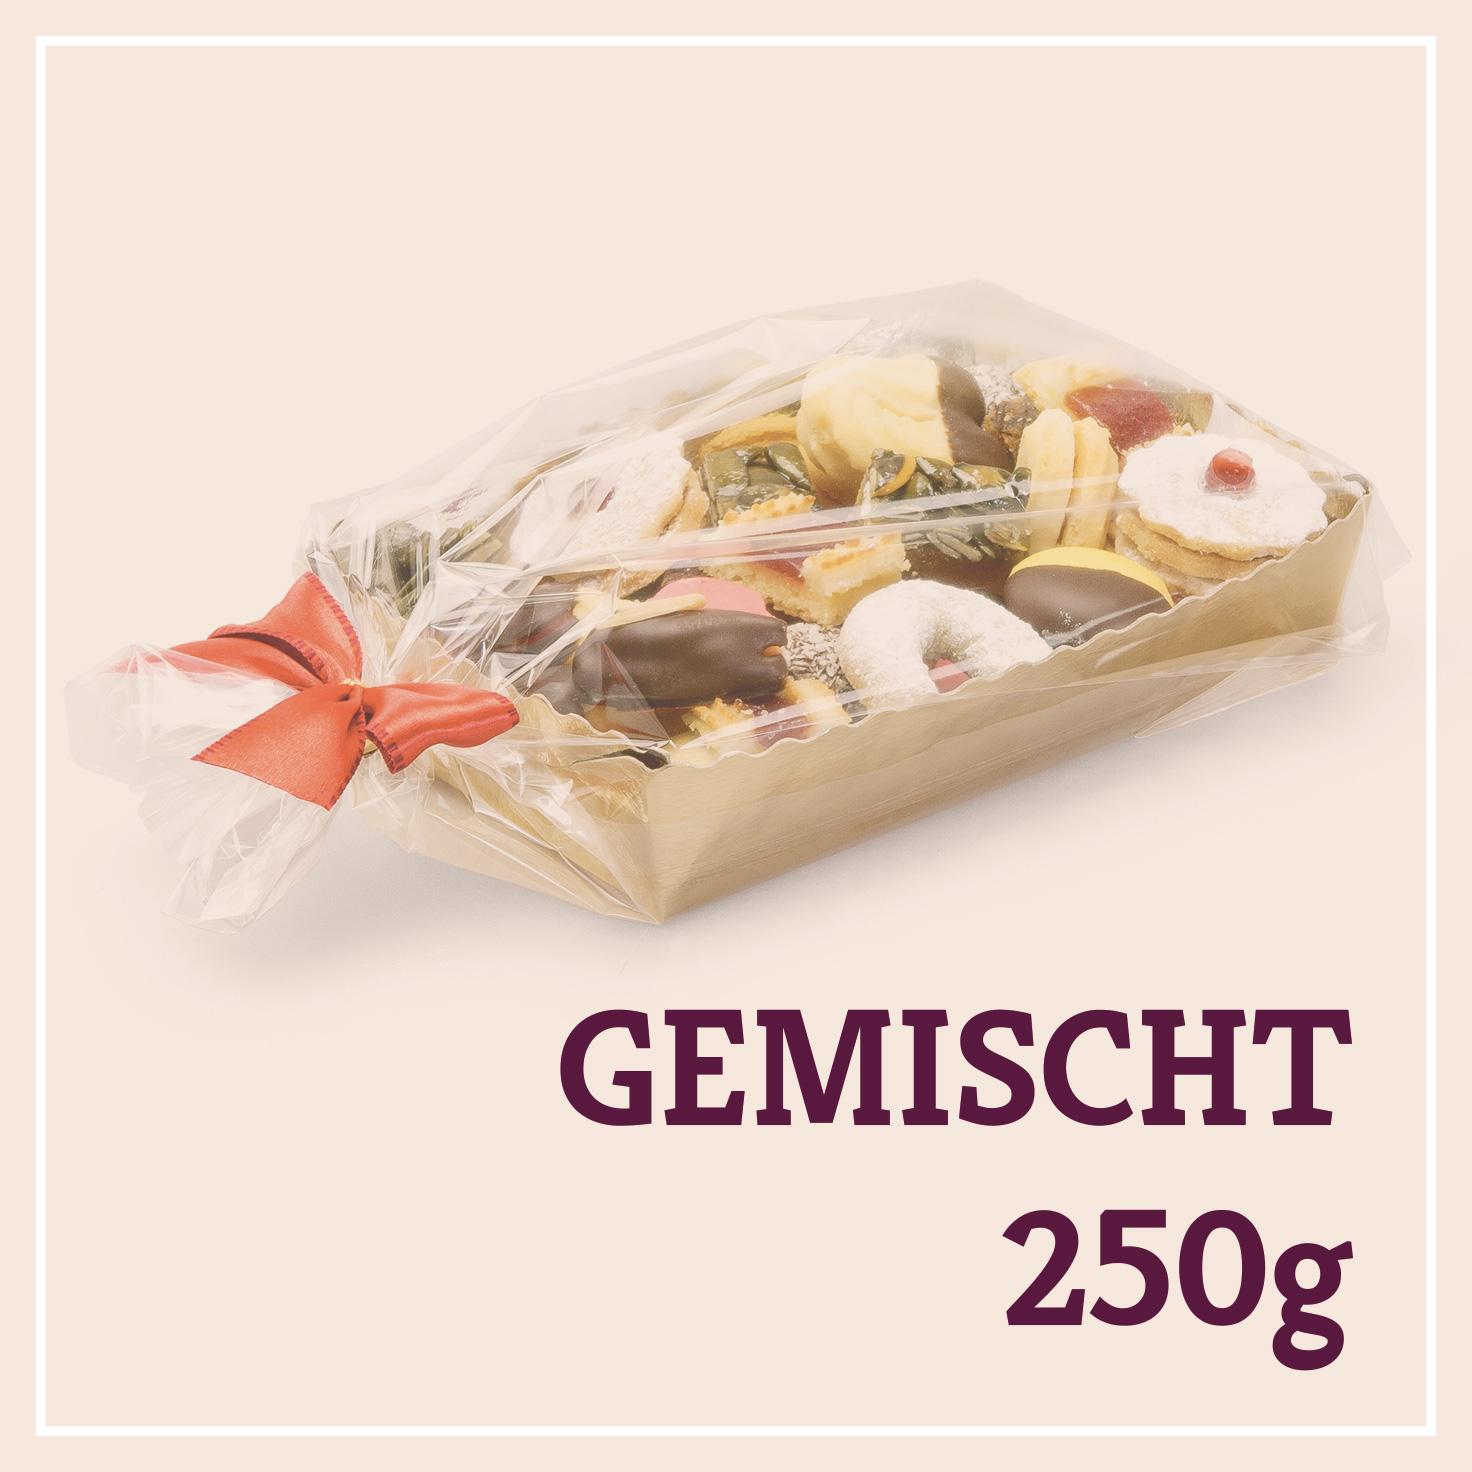 Heiss & Süß - Teebäckerei gemischt 250g in der Goldschale